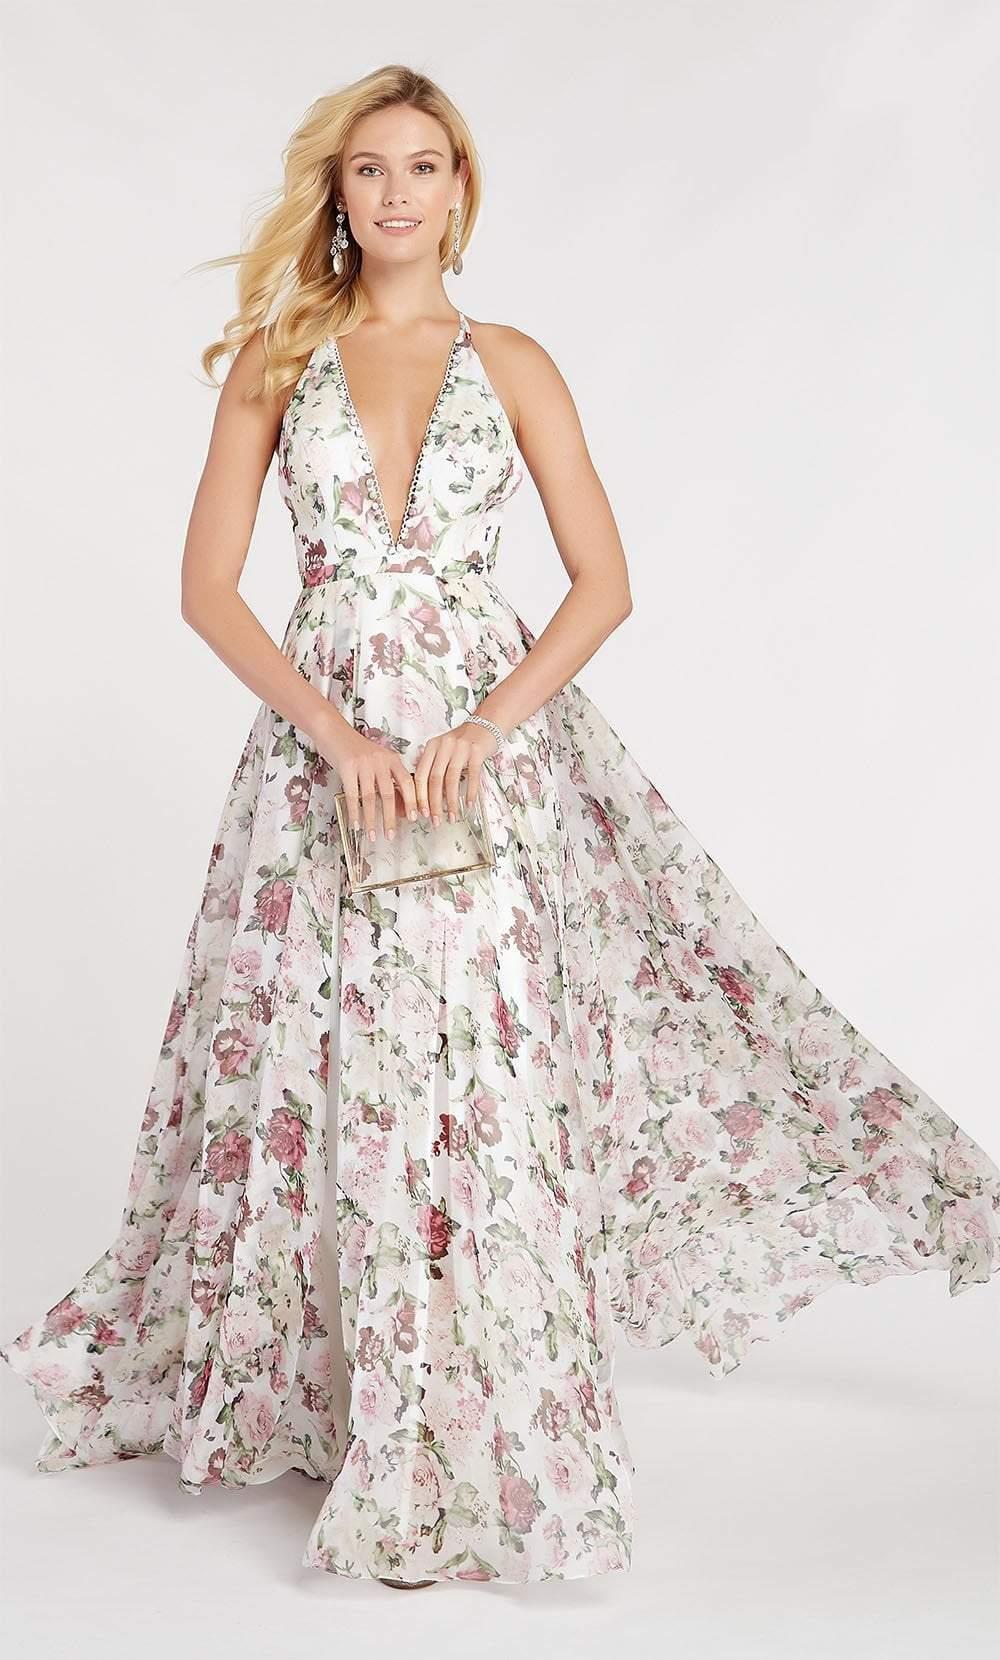 Alyce Paris - 60439 Floral Print Plunging Halter A-Line Gown